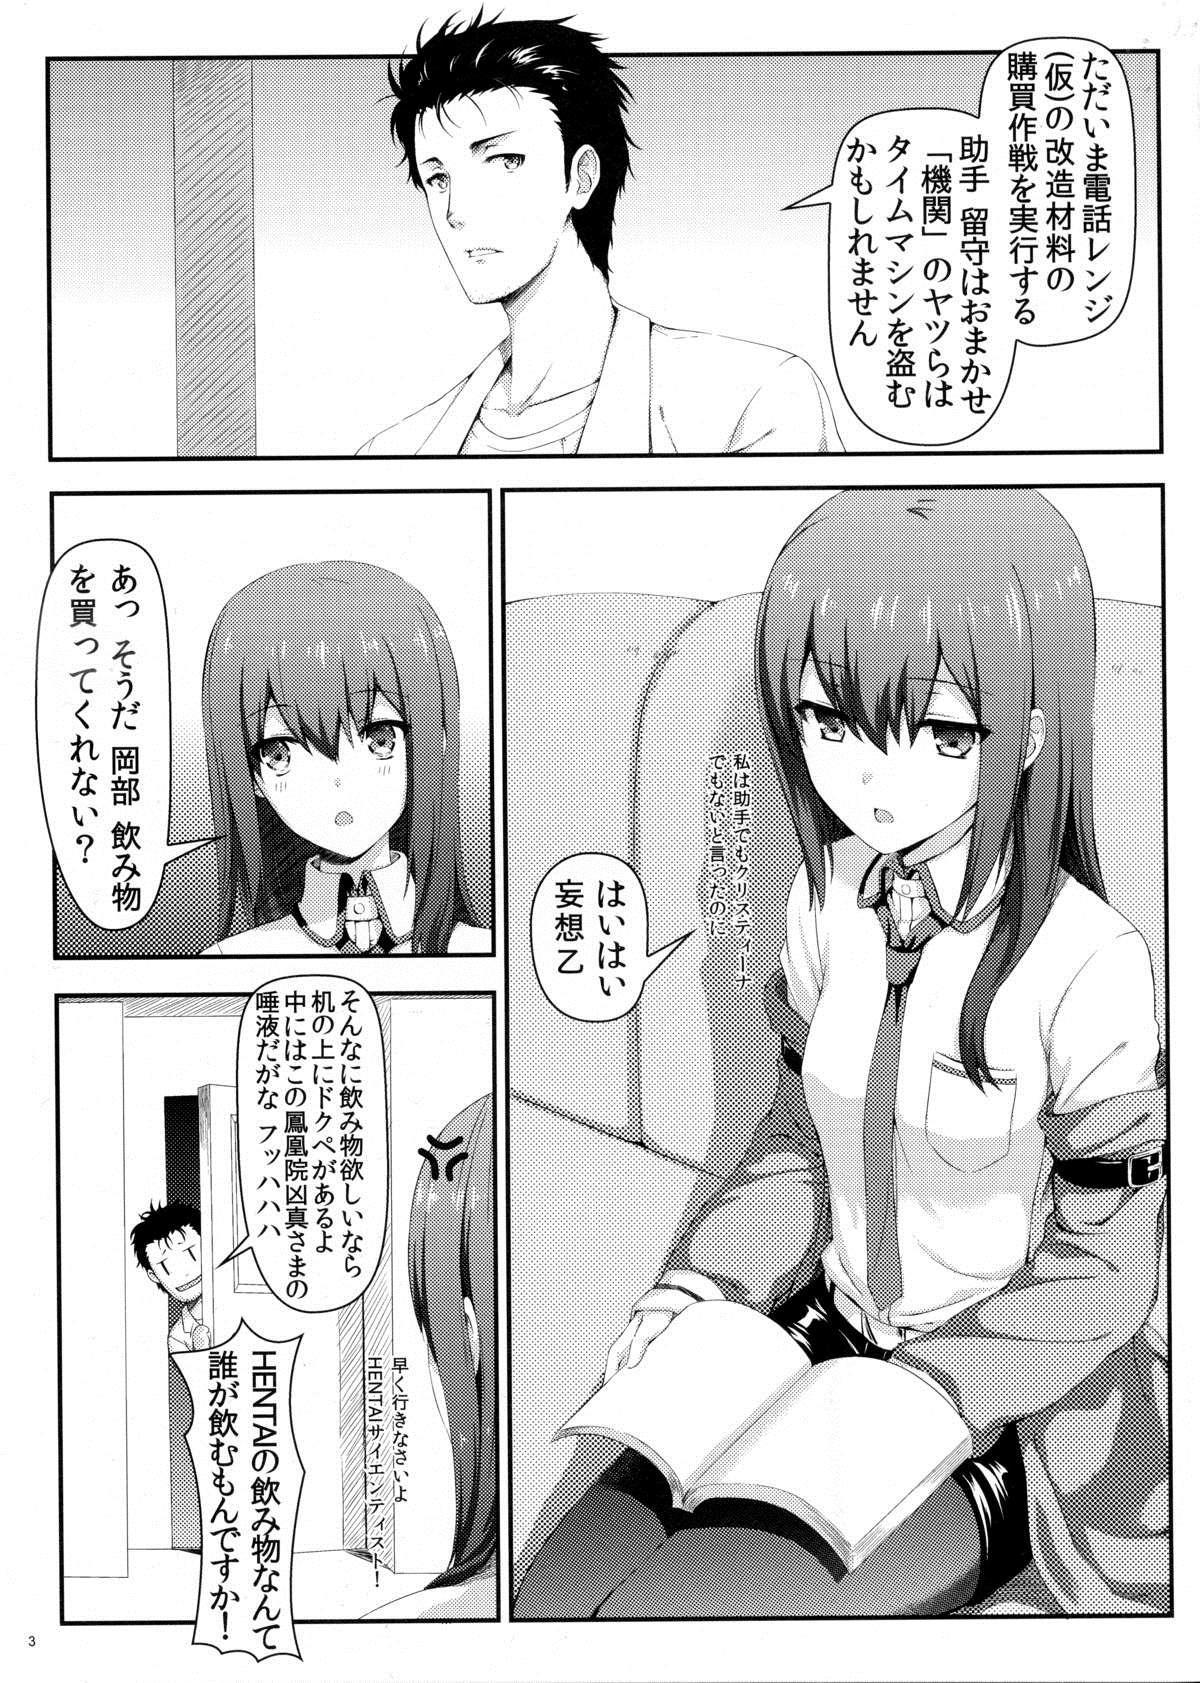 Tengoku e no Bullet Train 1